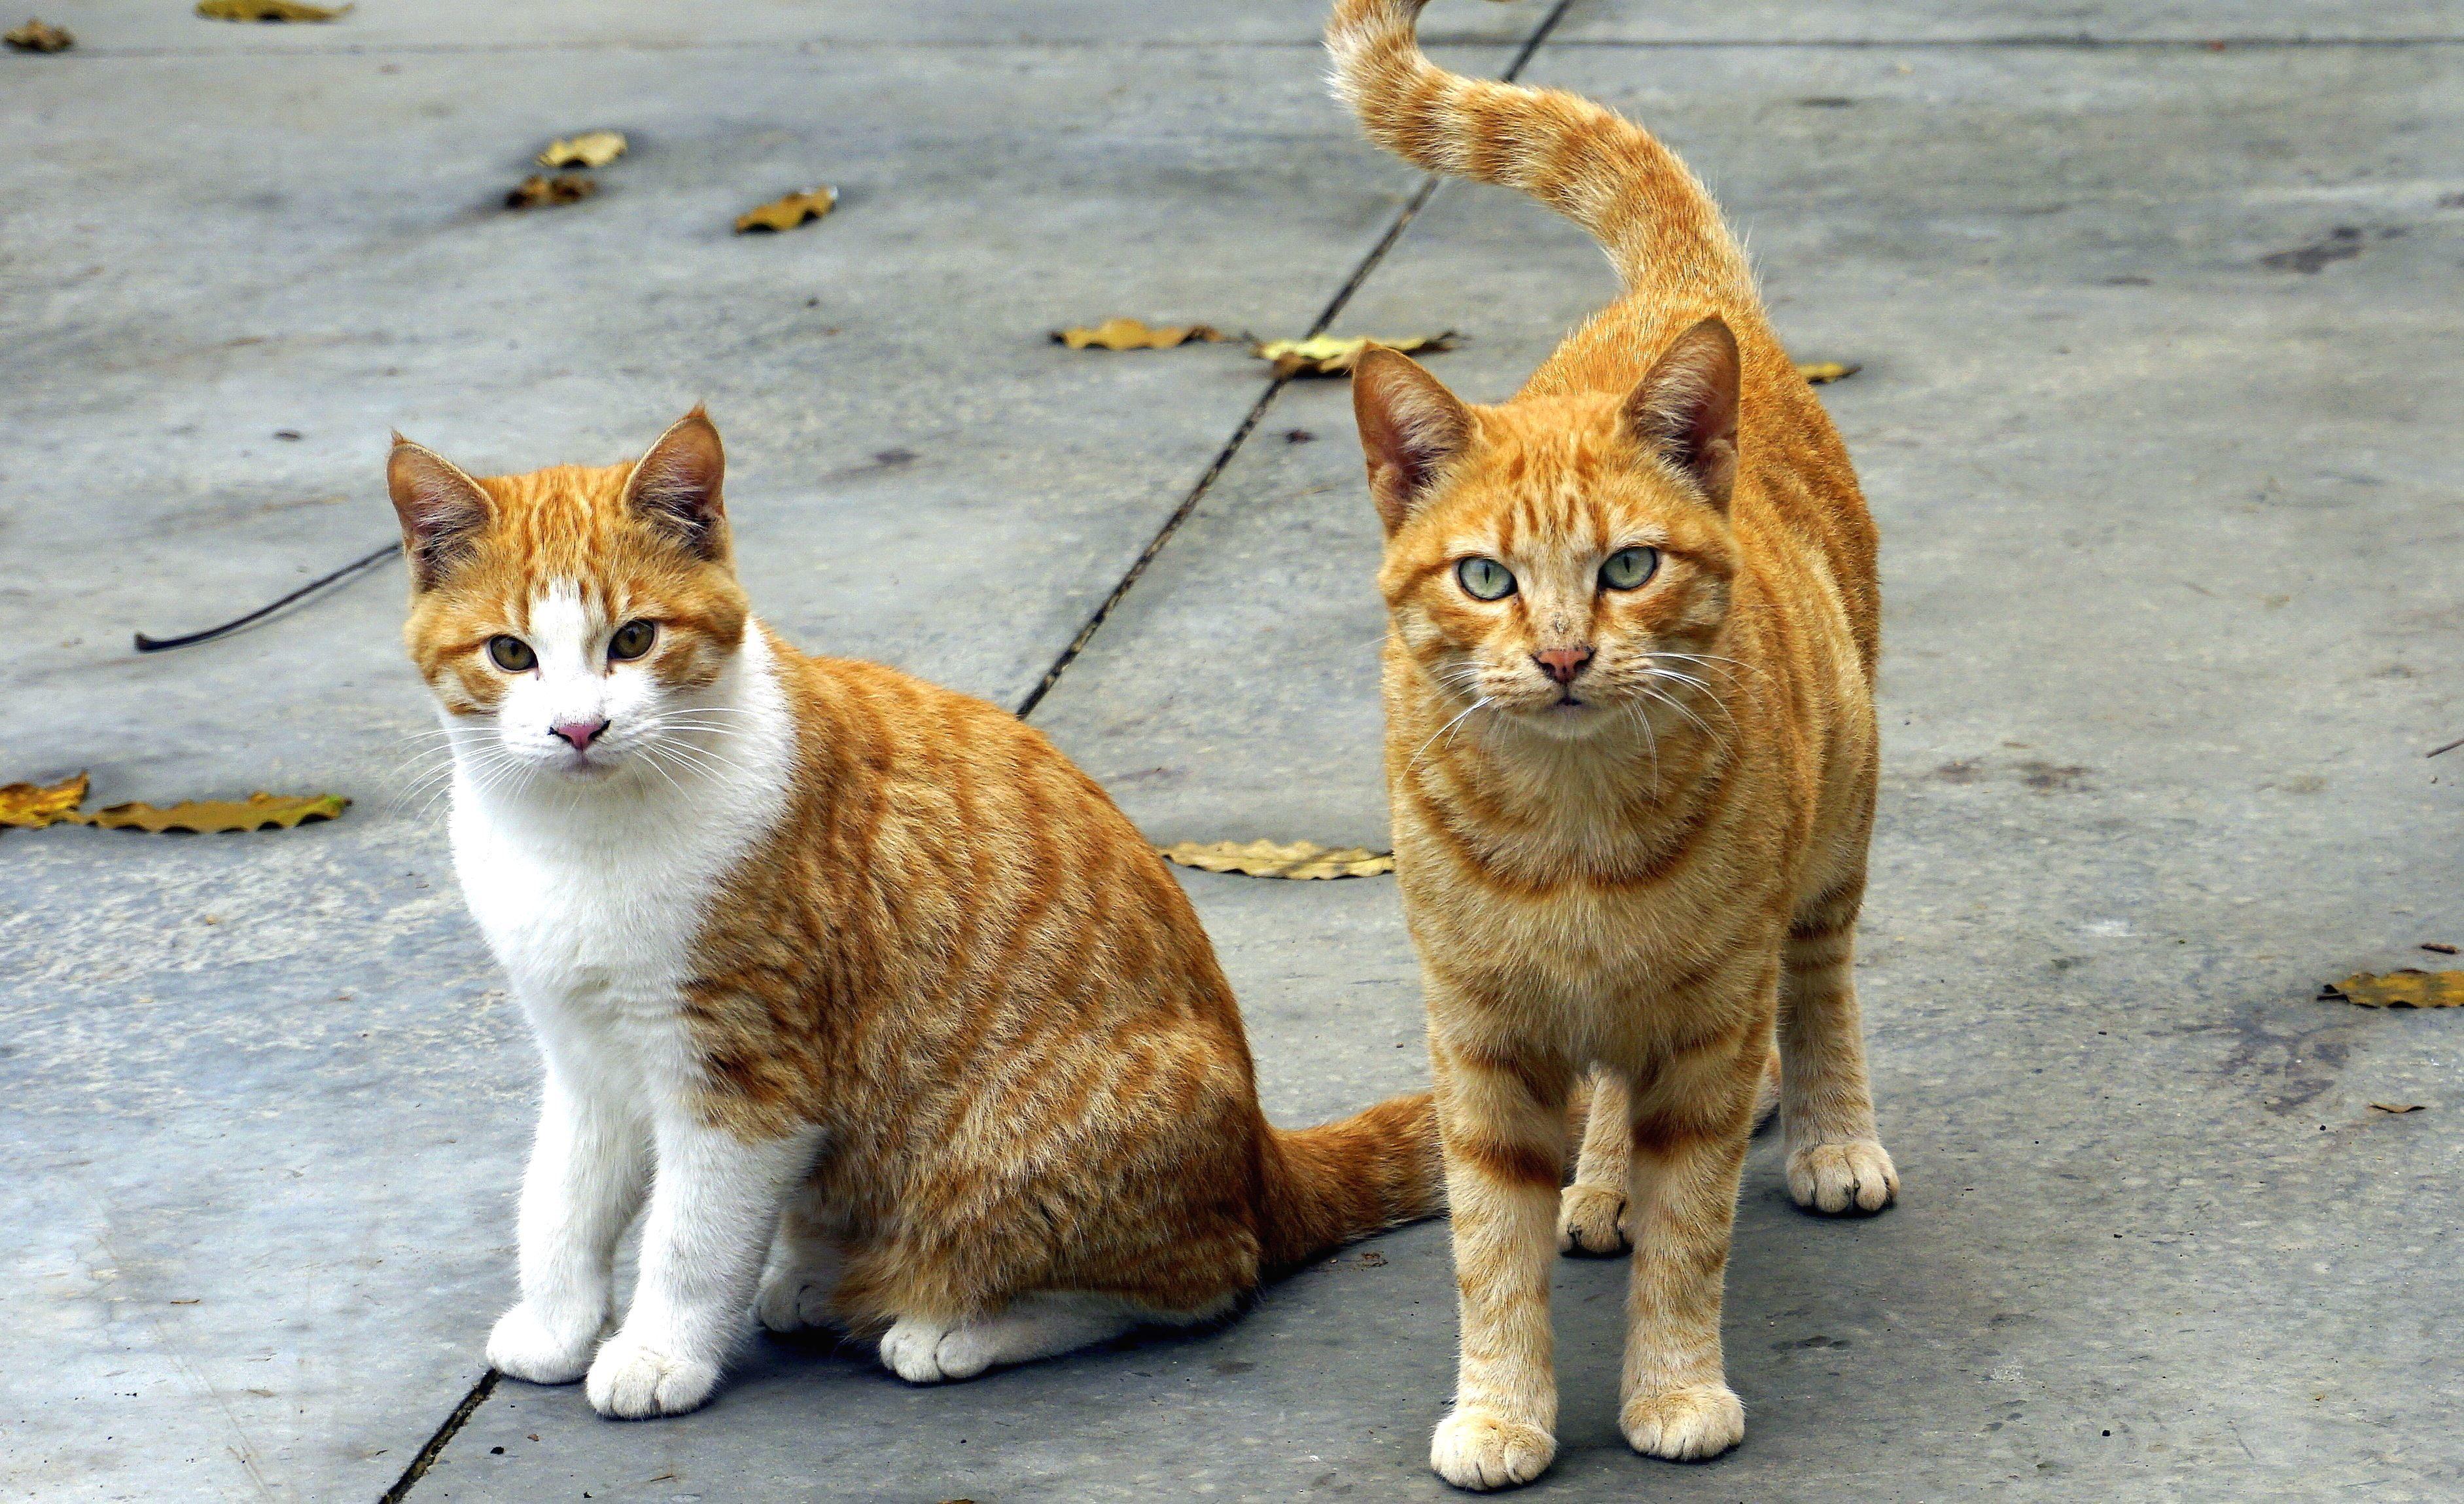 Download Wallpaper Cute Cat Free Picture Cats Domestic Cat Animals Kitten Feline